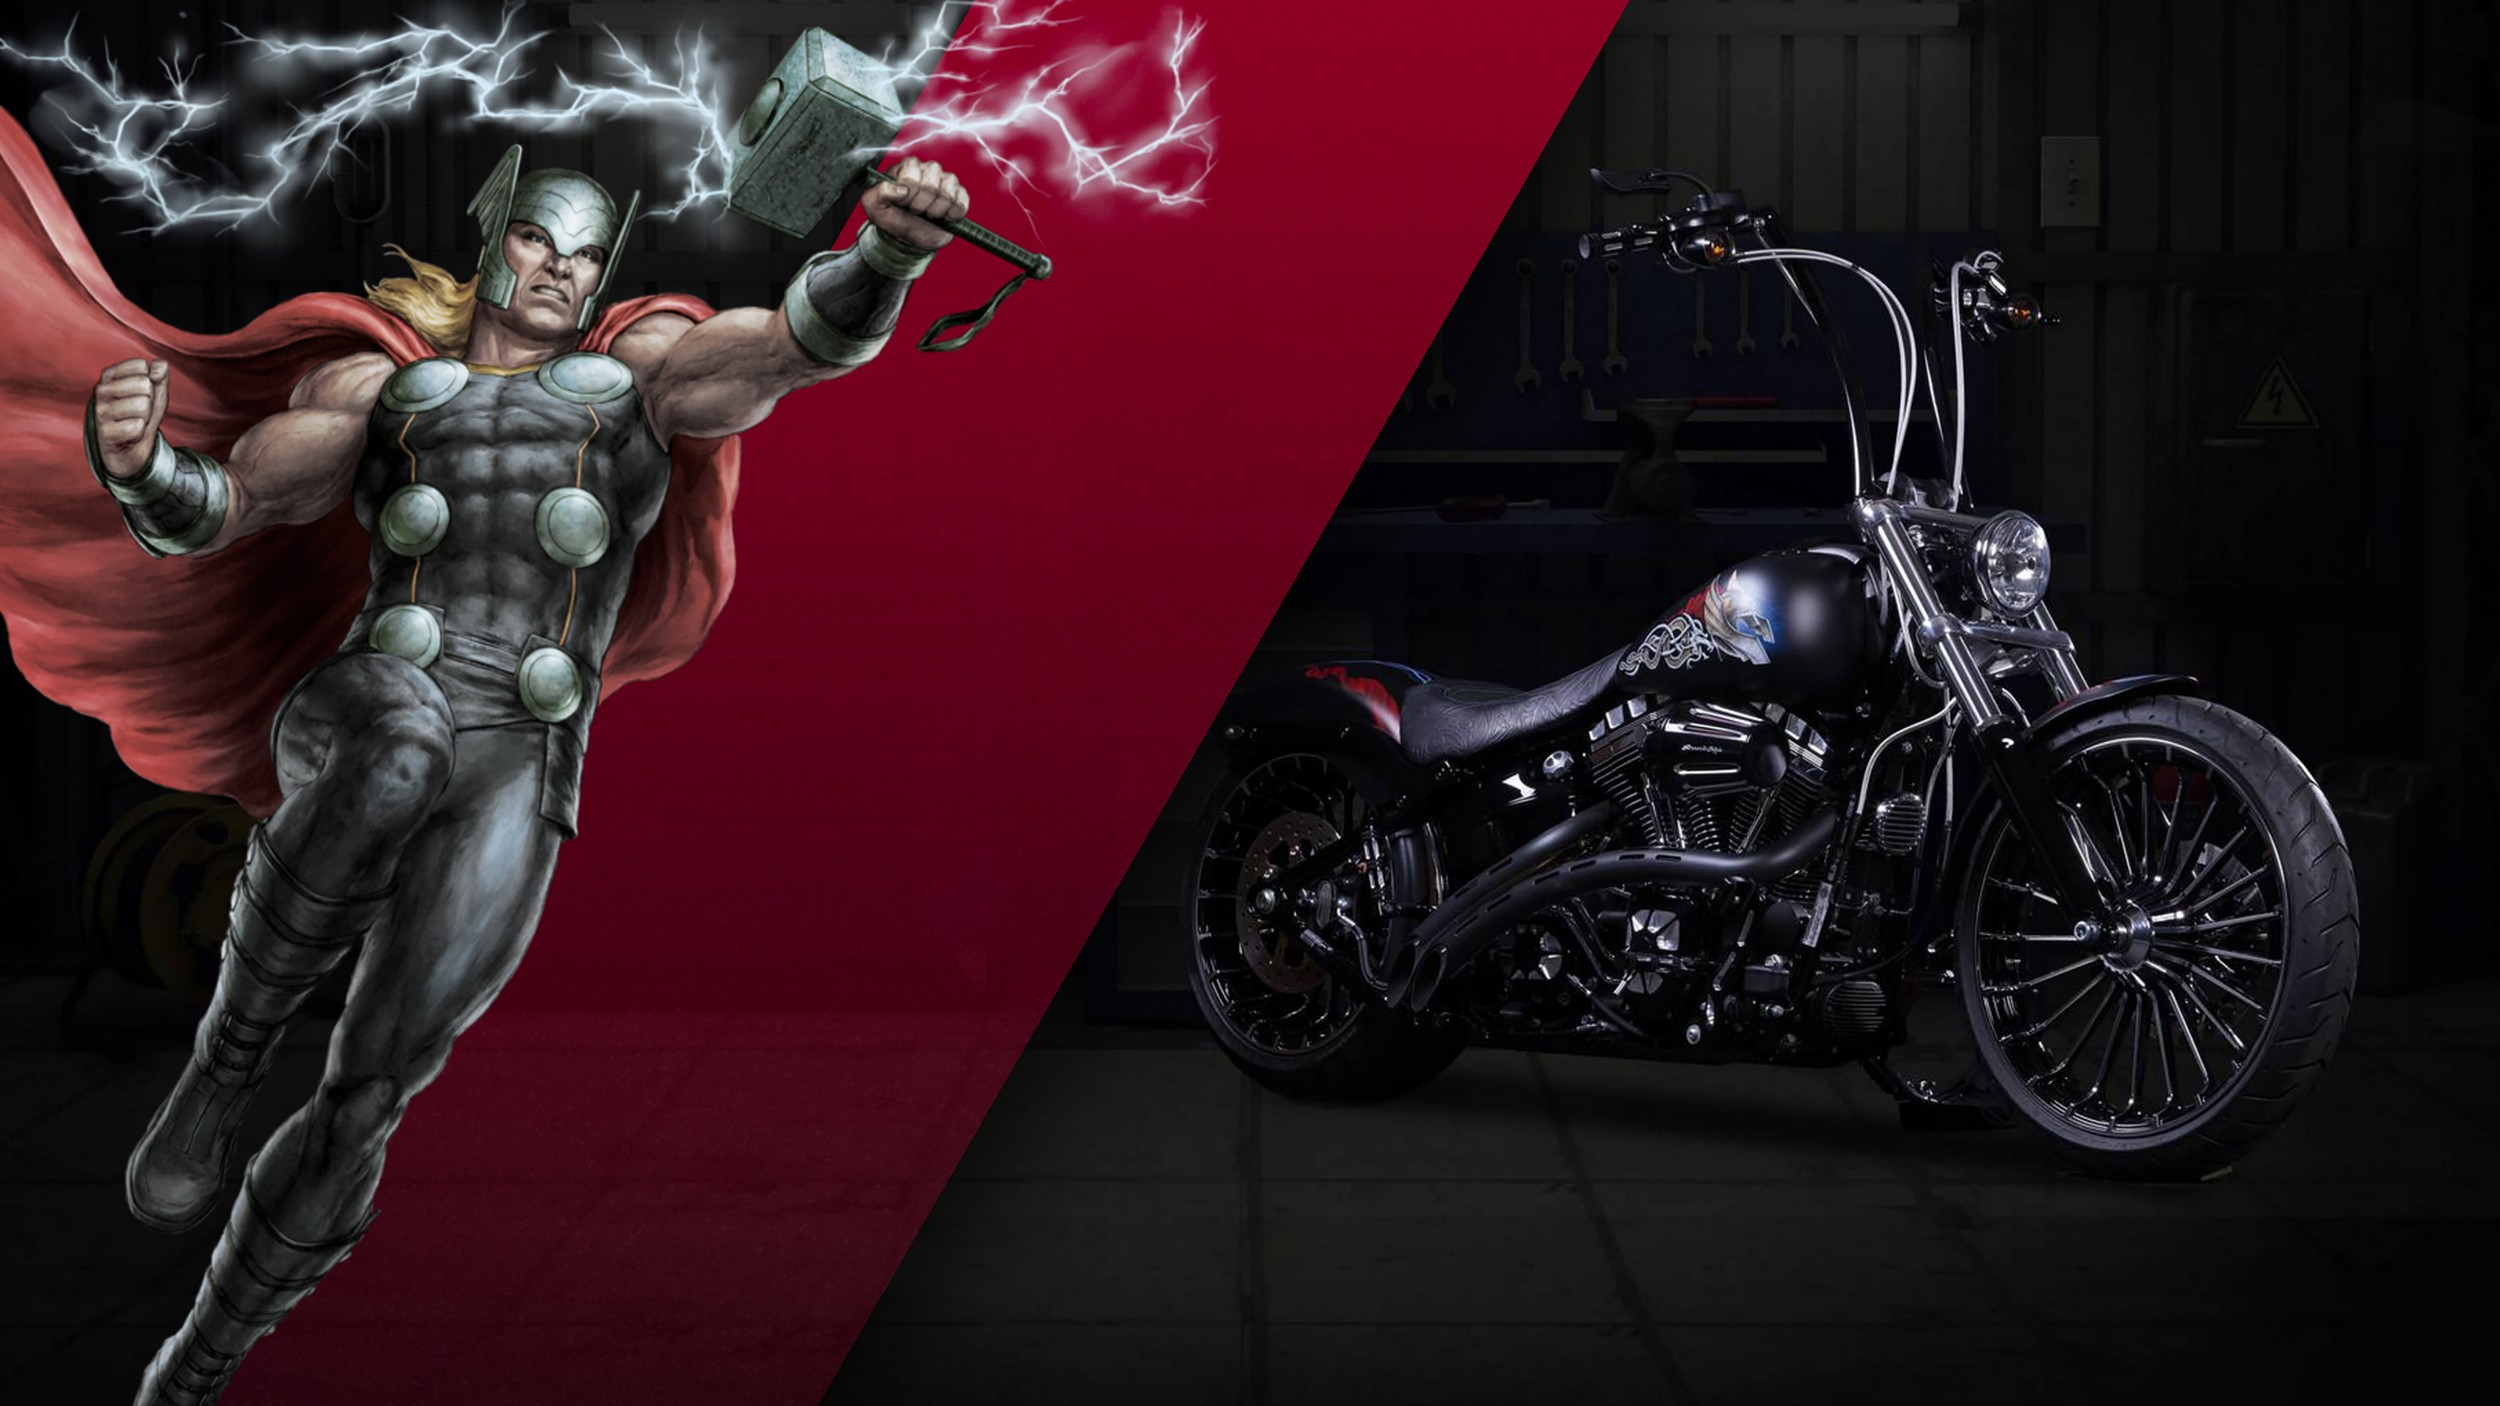 Bmw Car And Bike Wallpaper Marvel Superhero Harley Davidson Bikes Surface In The Land